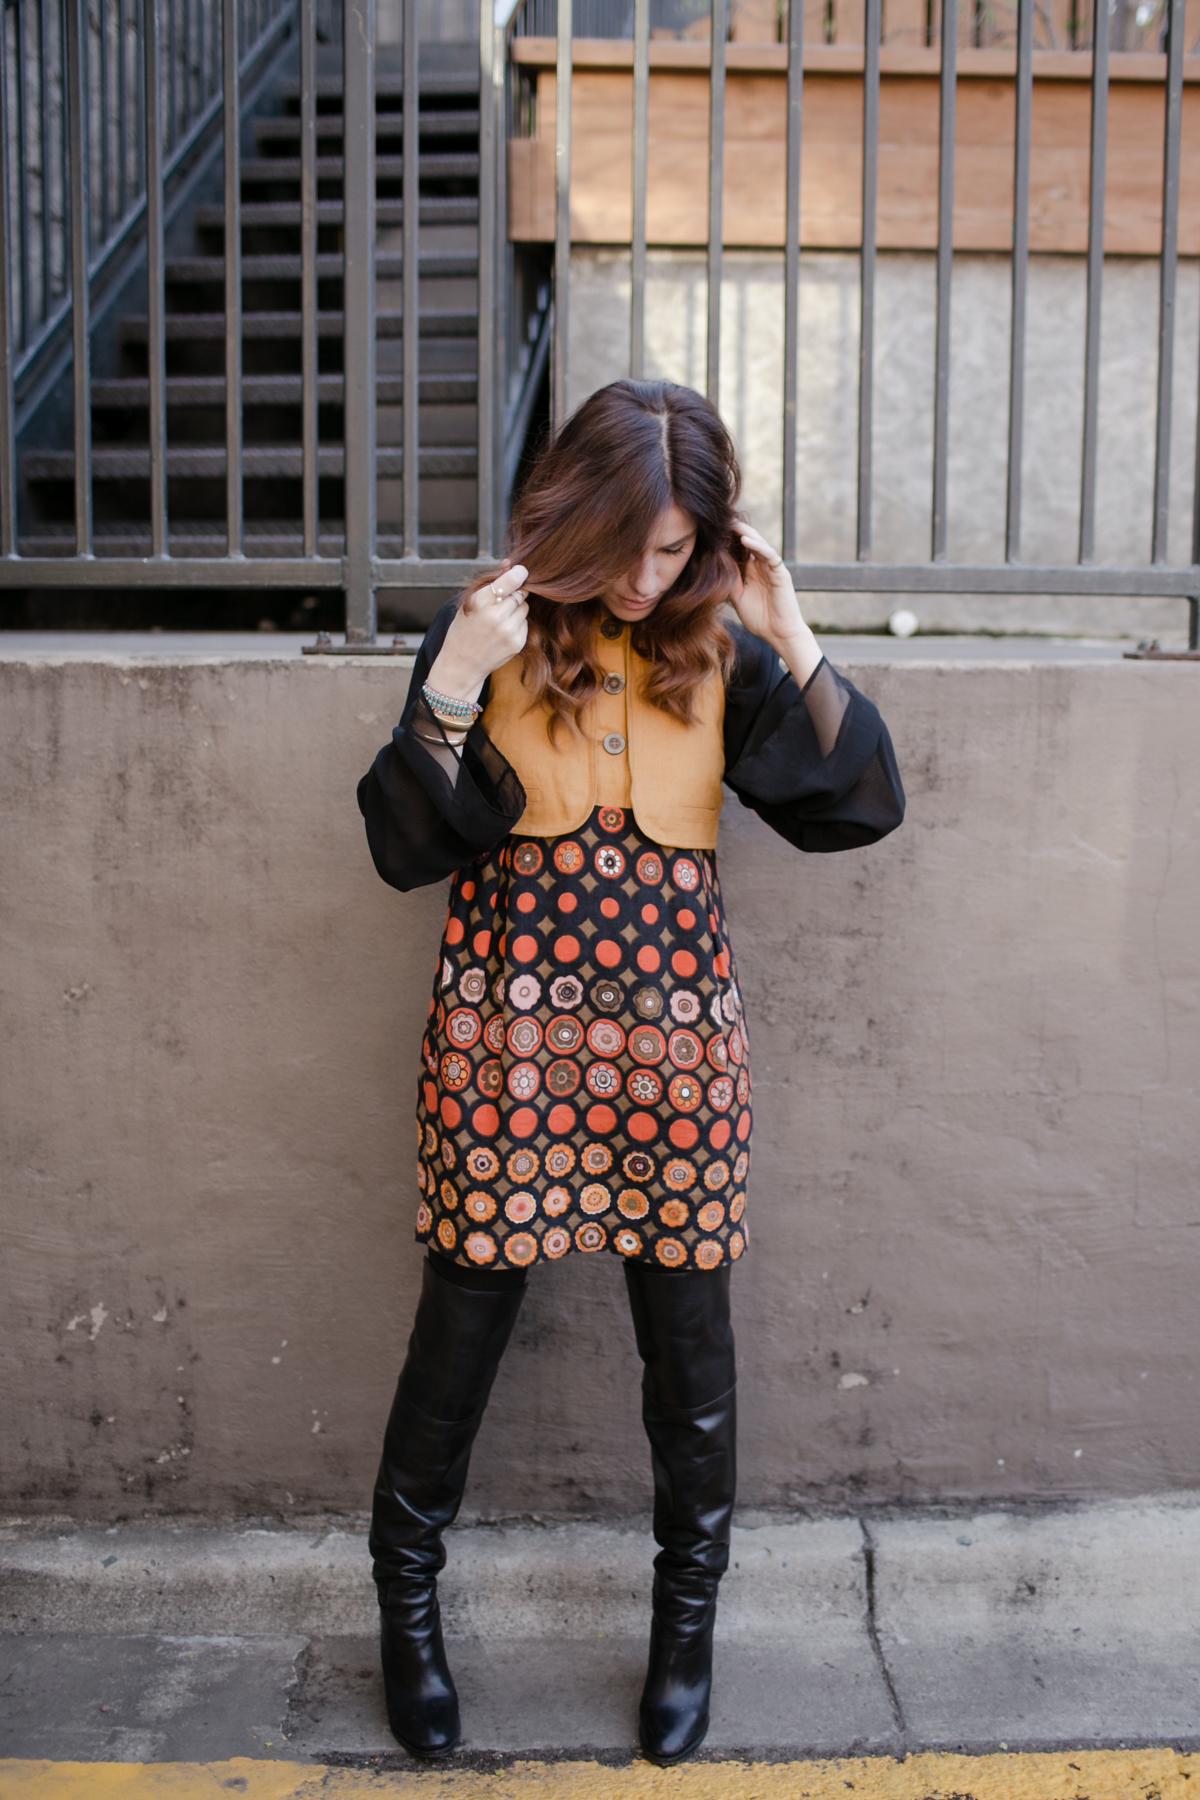 Eldridge Edit_Anna_E_Cottrell_Tulip_Louise_Fashion_Blogger_Chloe_Dress_seventies_Ralph_Lauren_Over_The_Knee_Boots_Black_4.jpg